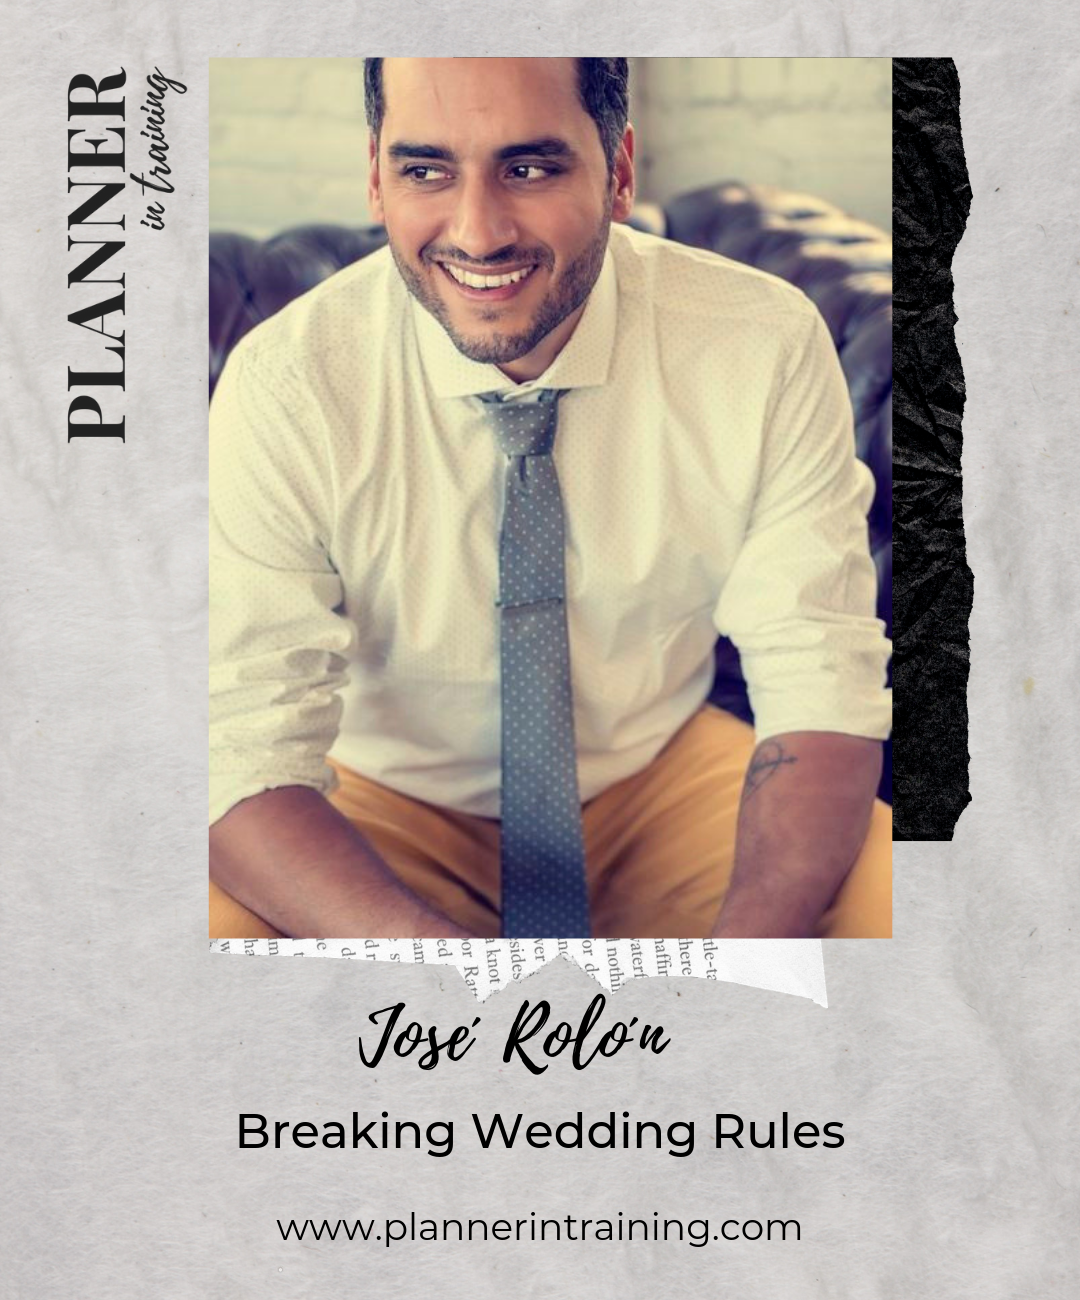 jose rolon wedding planner classes wisconsin